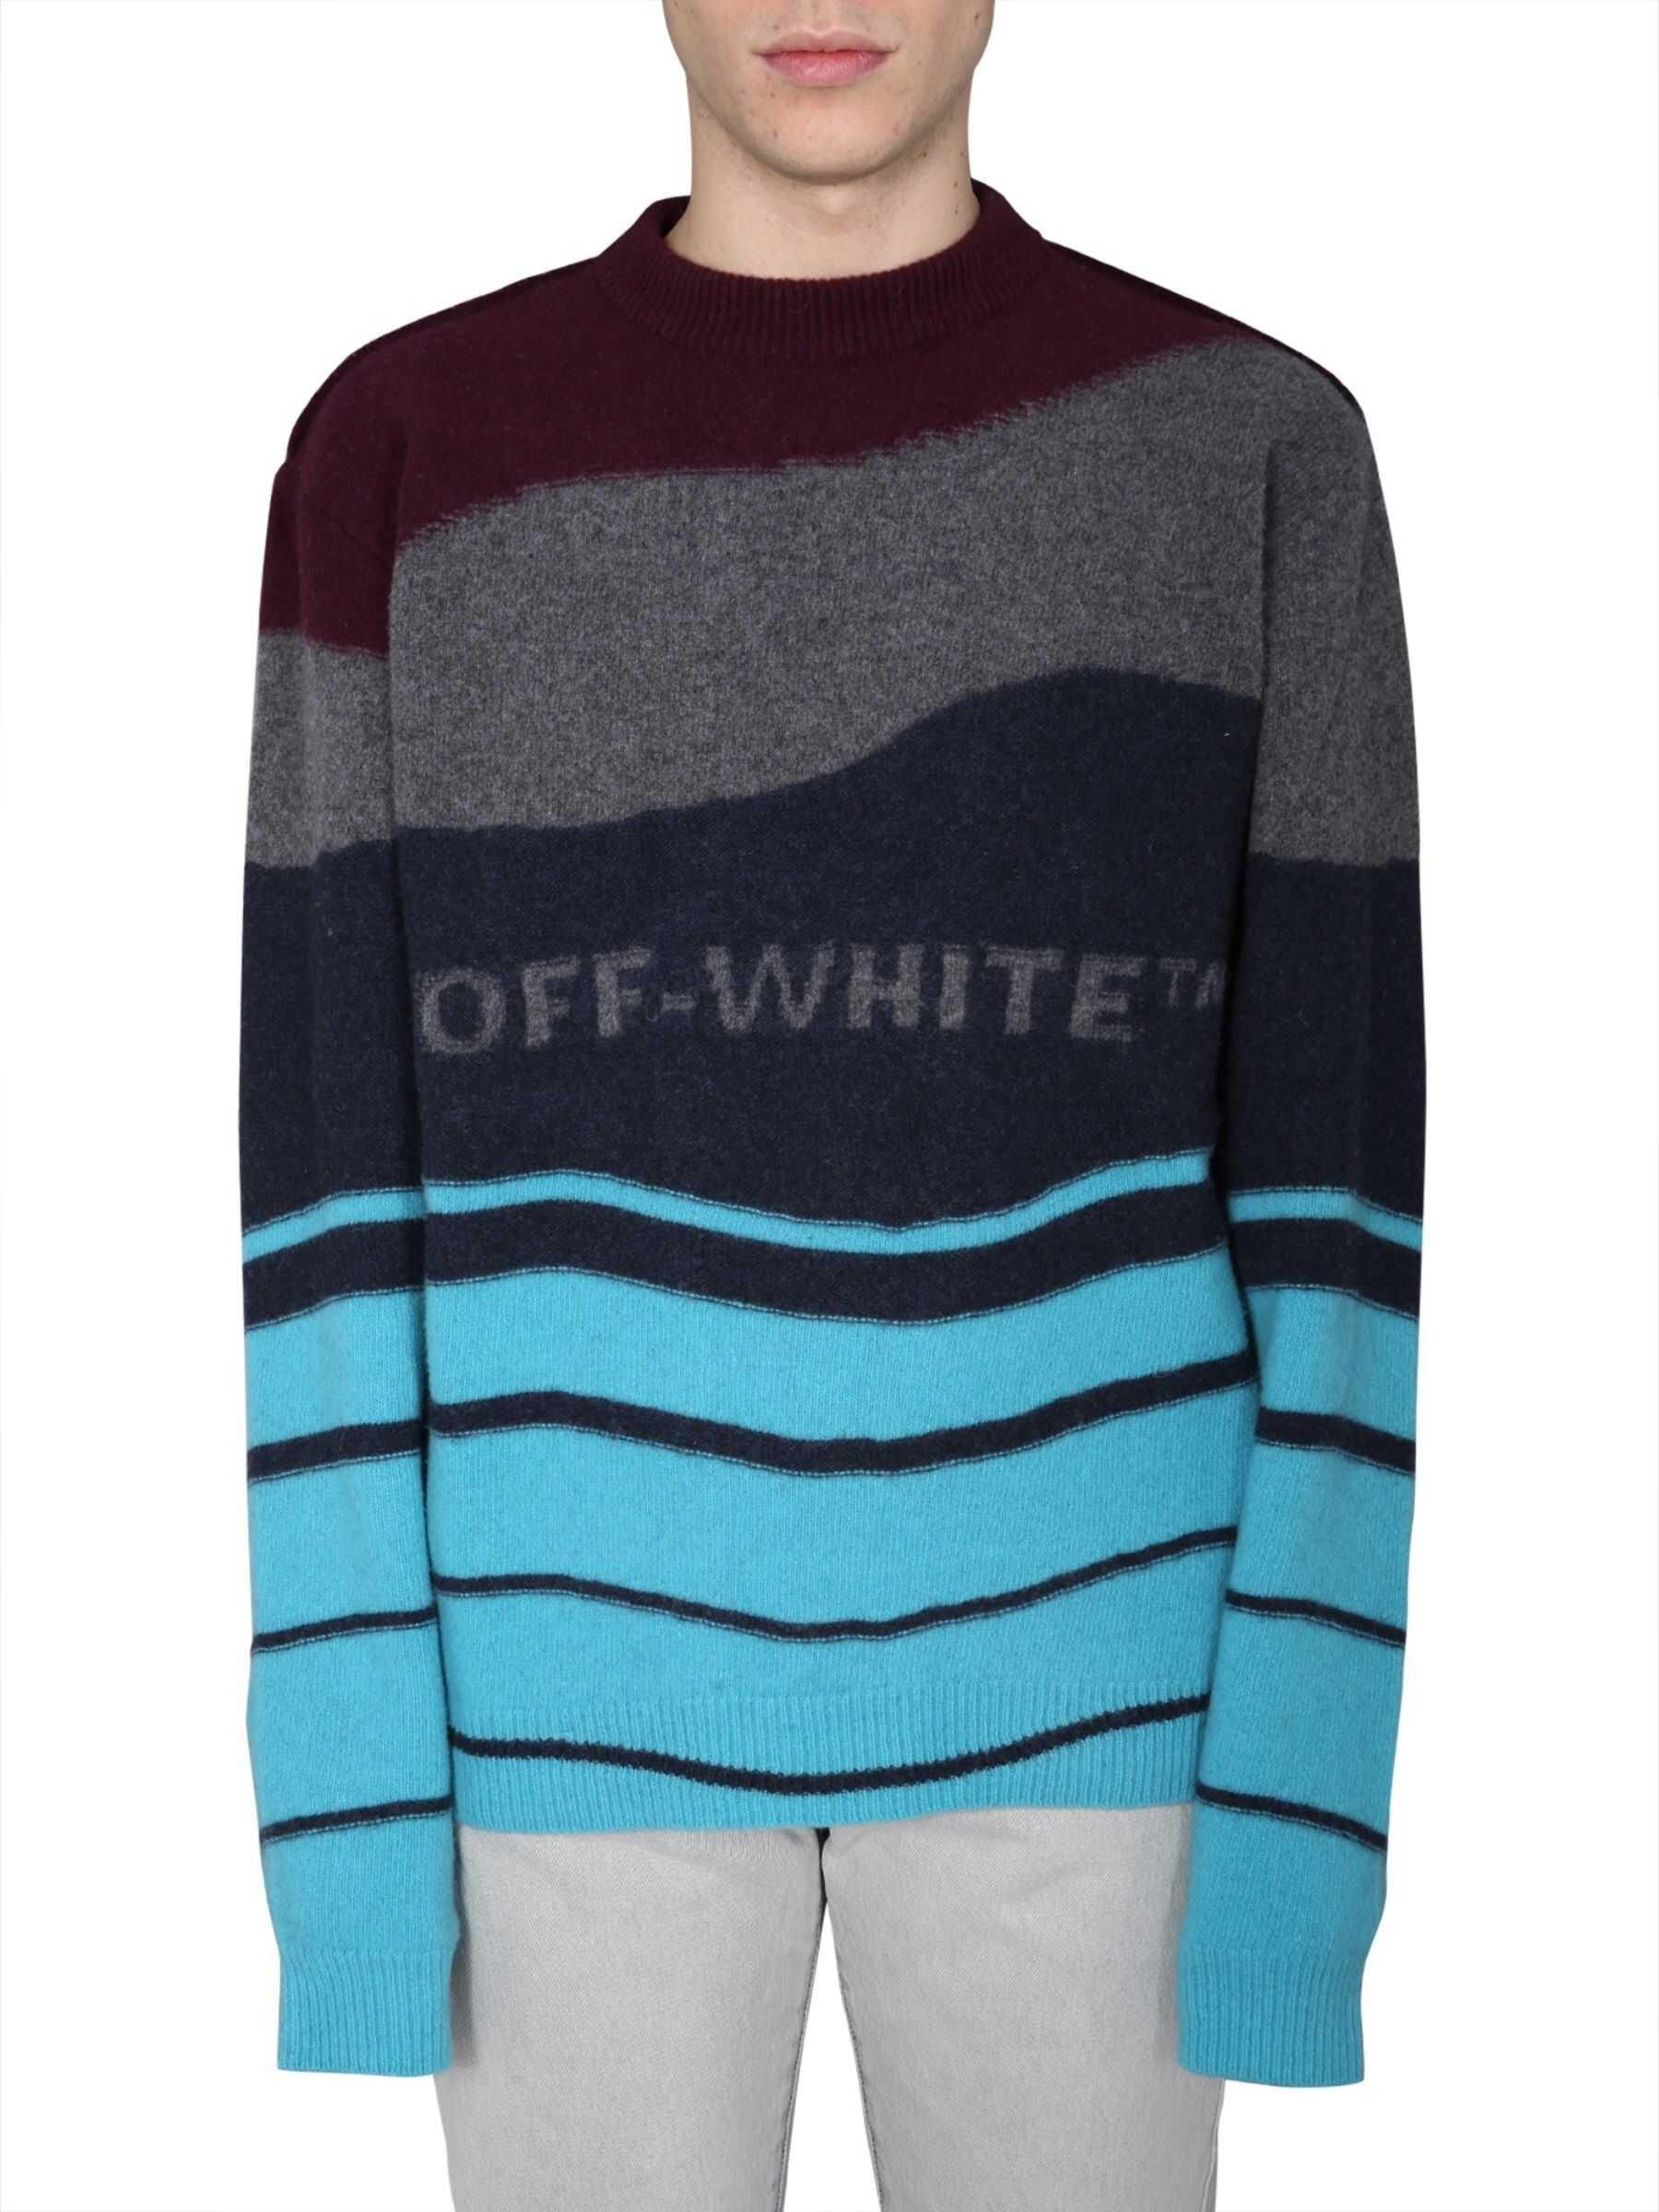 Off-White Crew Neck Sweater BORDEAUX